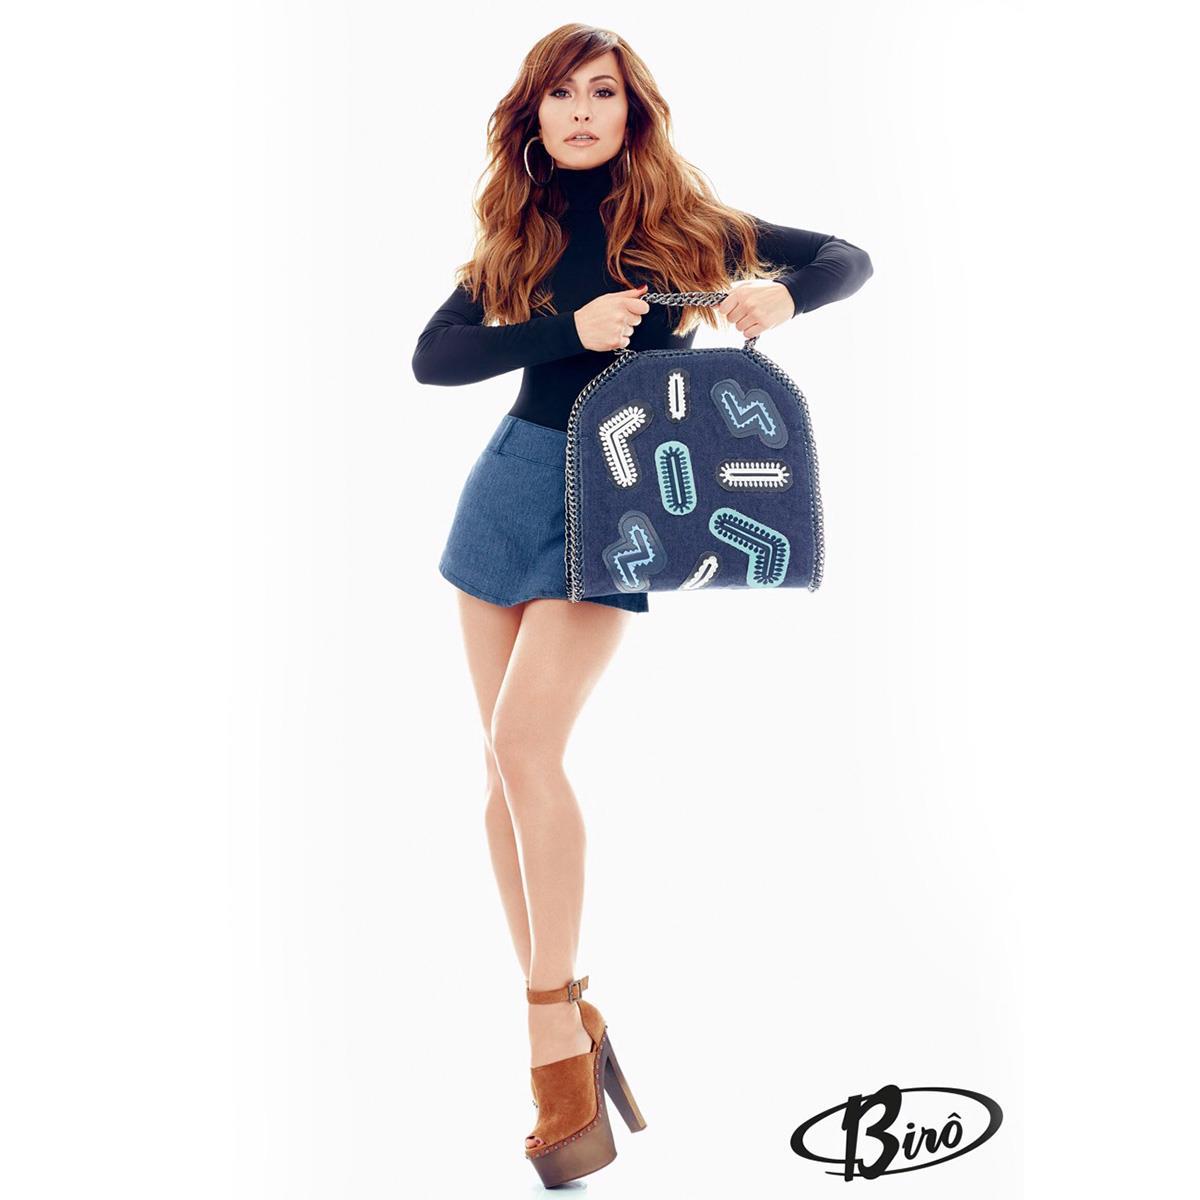 0023d411a2397 Bolsa Jeans Sabrina Sato 10650019